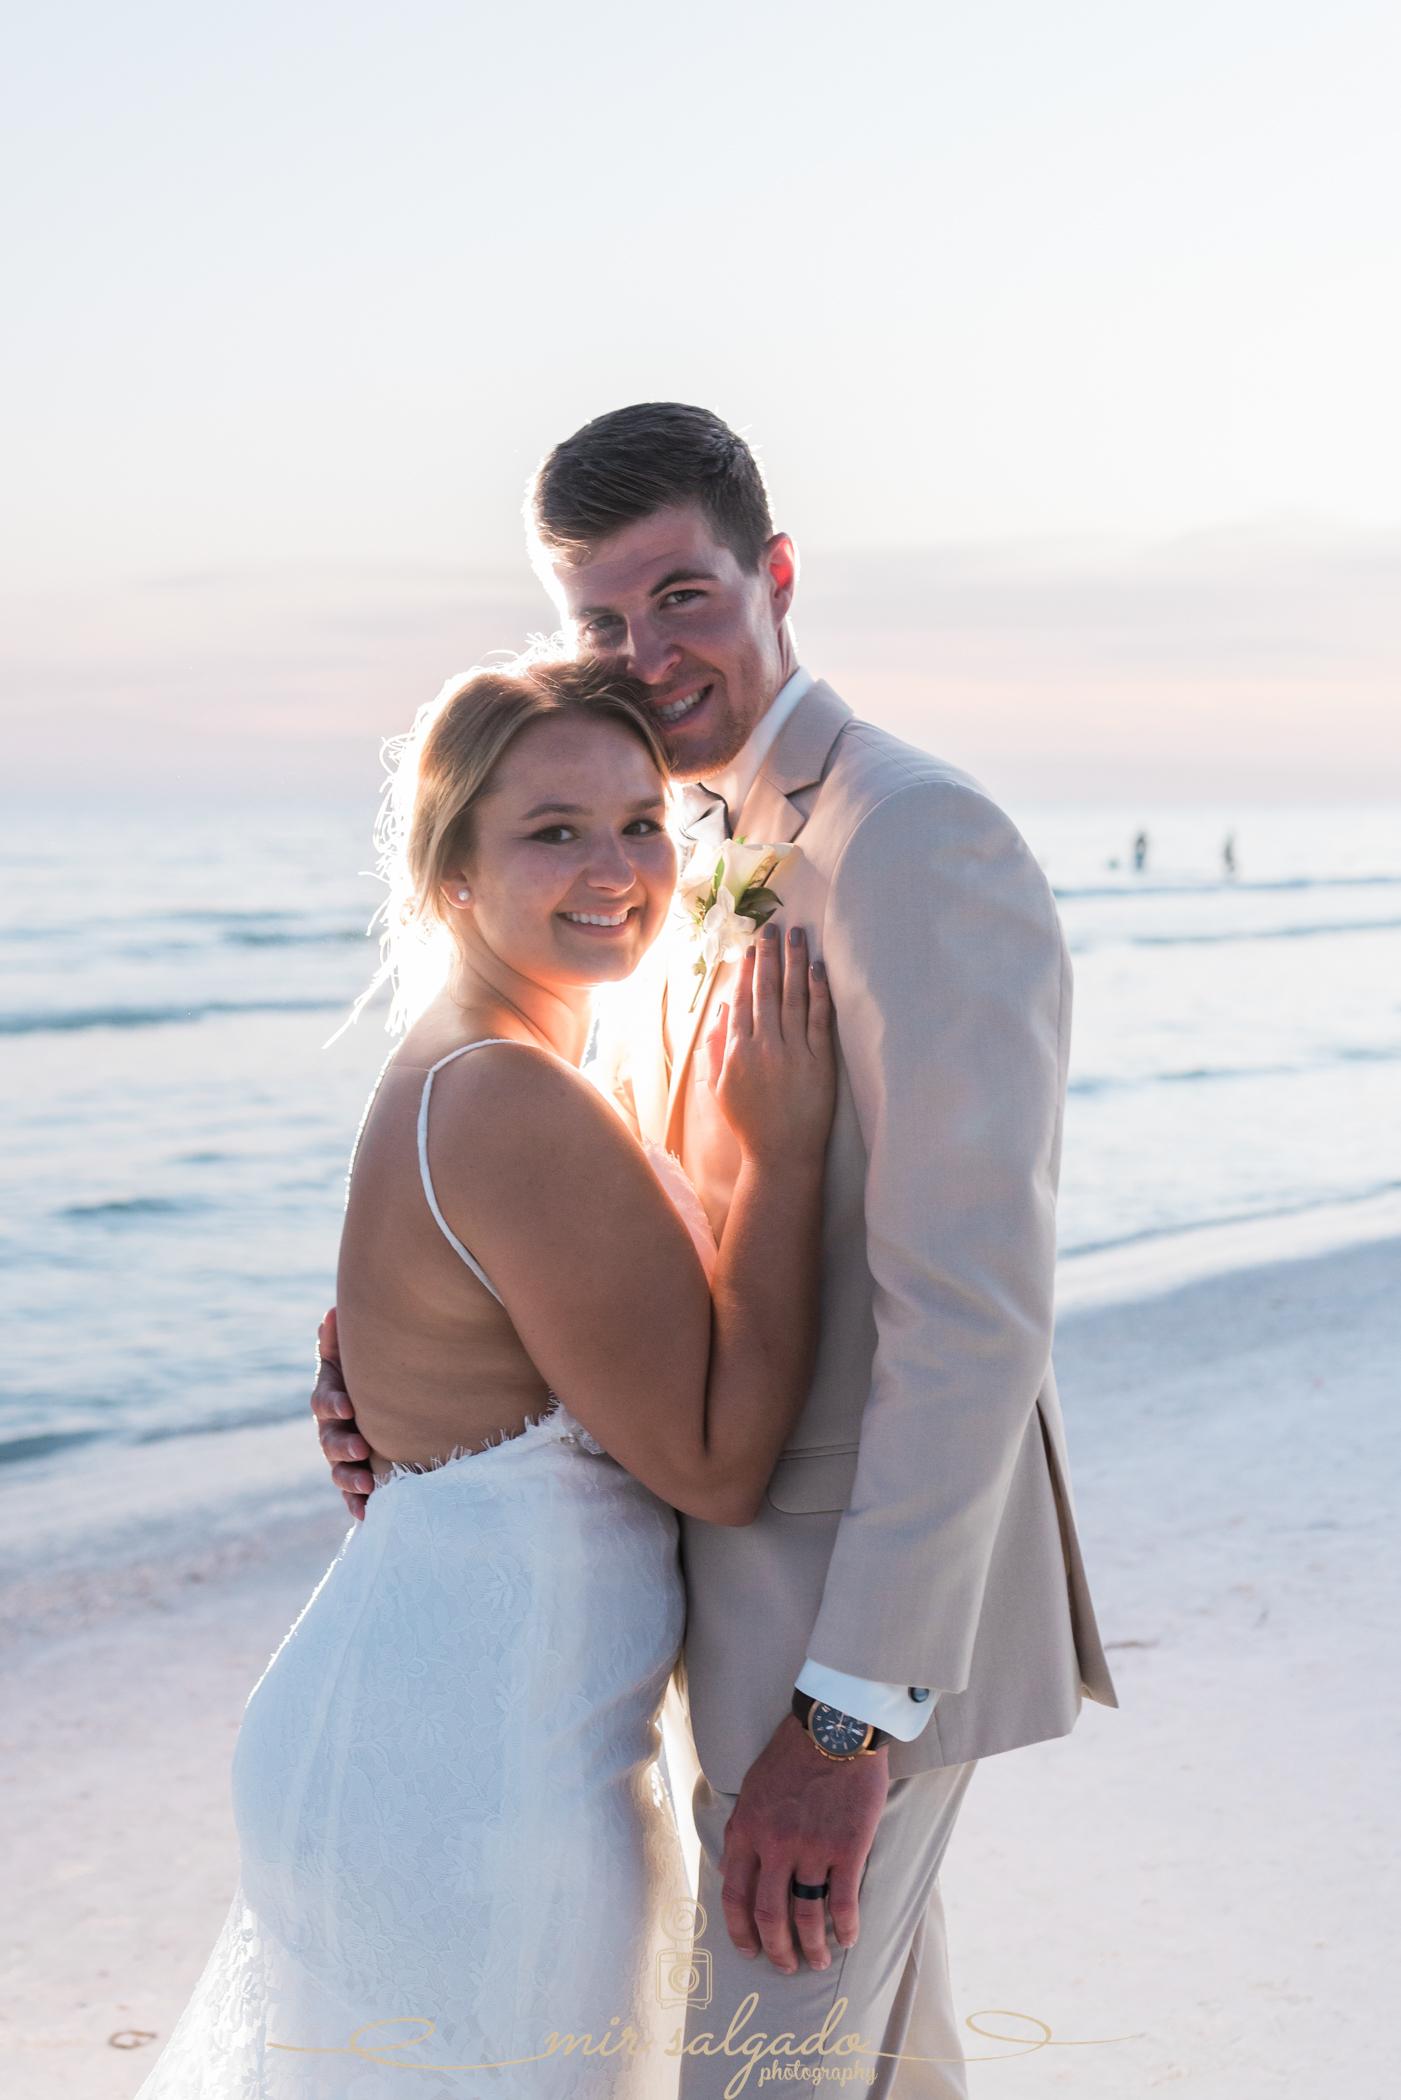 Florida-beach-wedding, bride-and-groom-beach-wedding-photo